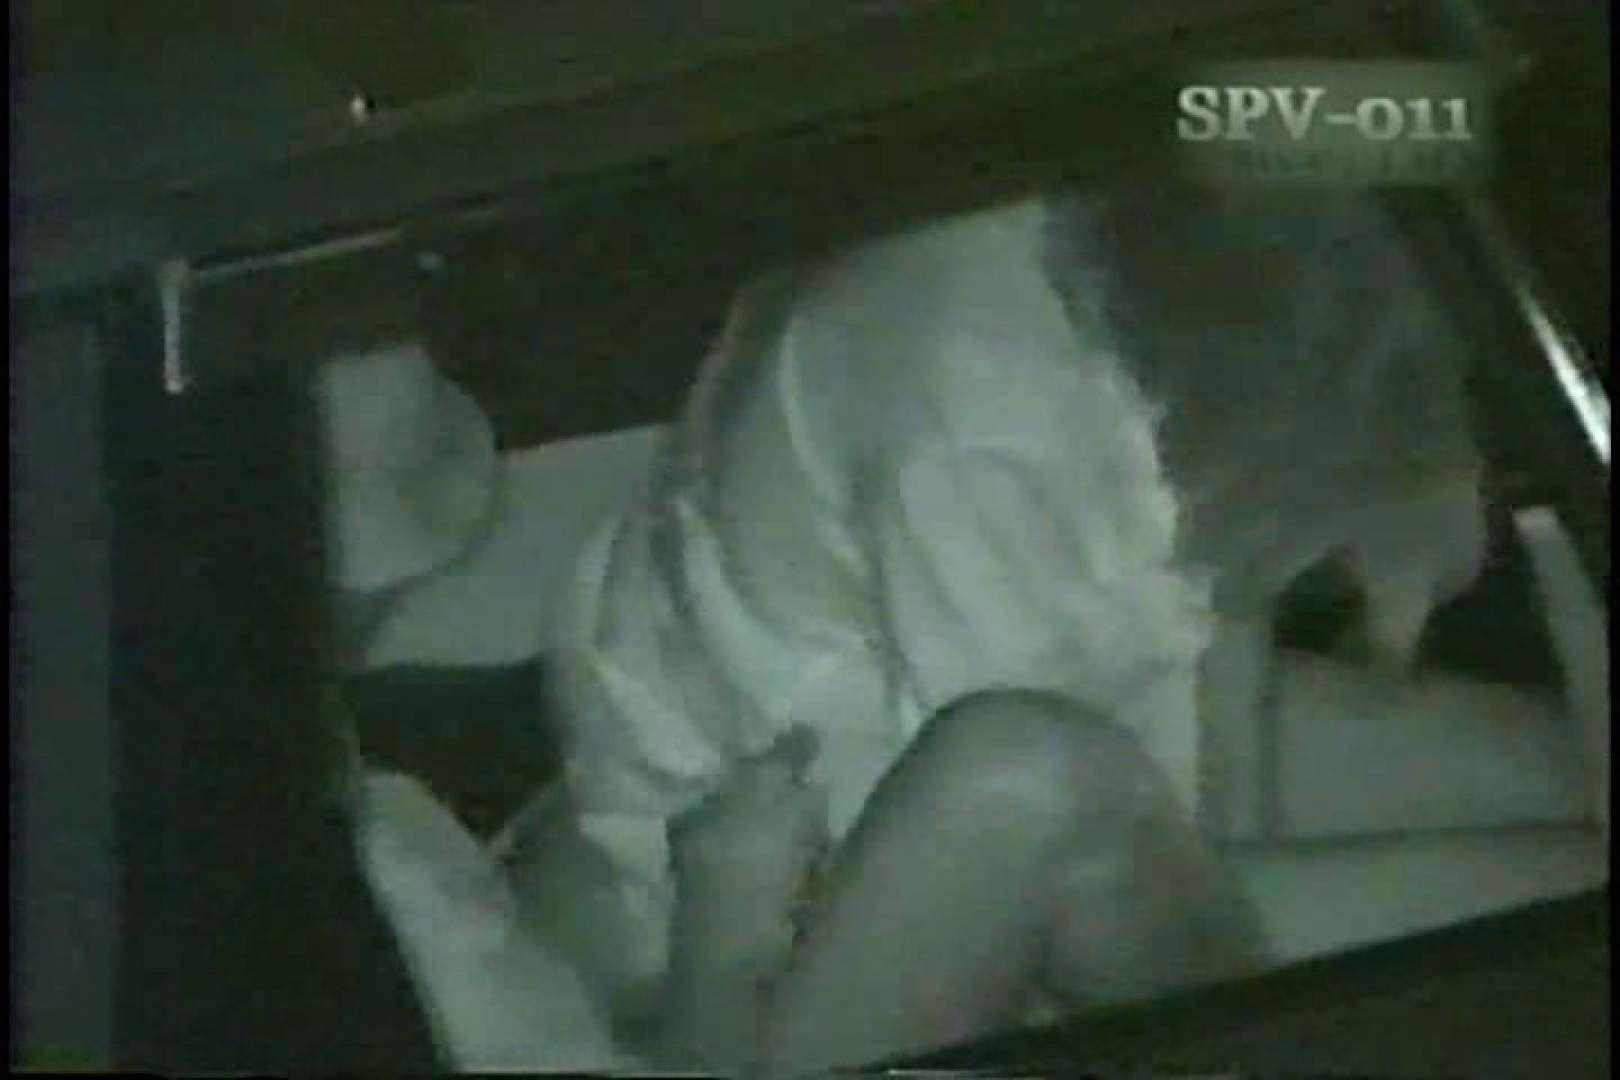 高画質版!SPD-011 盗撮 カーセックス黙示録 (VHS) 高画質 | 女体盗撮  104連発 31